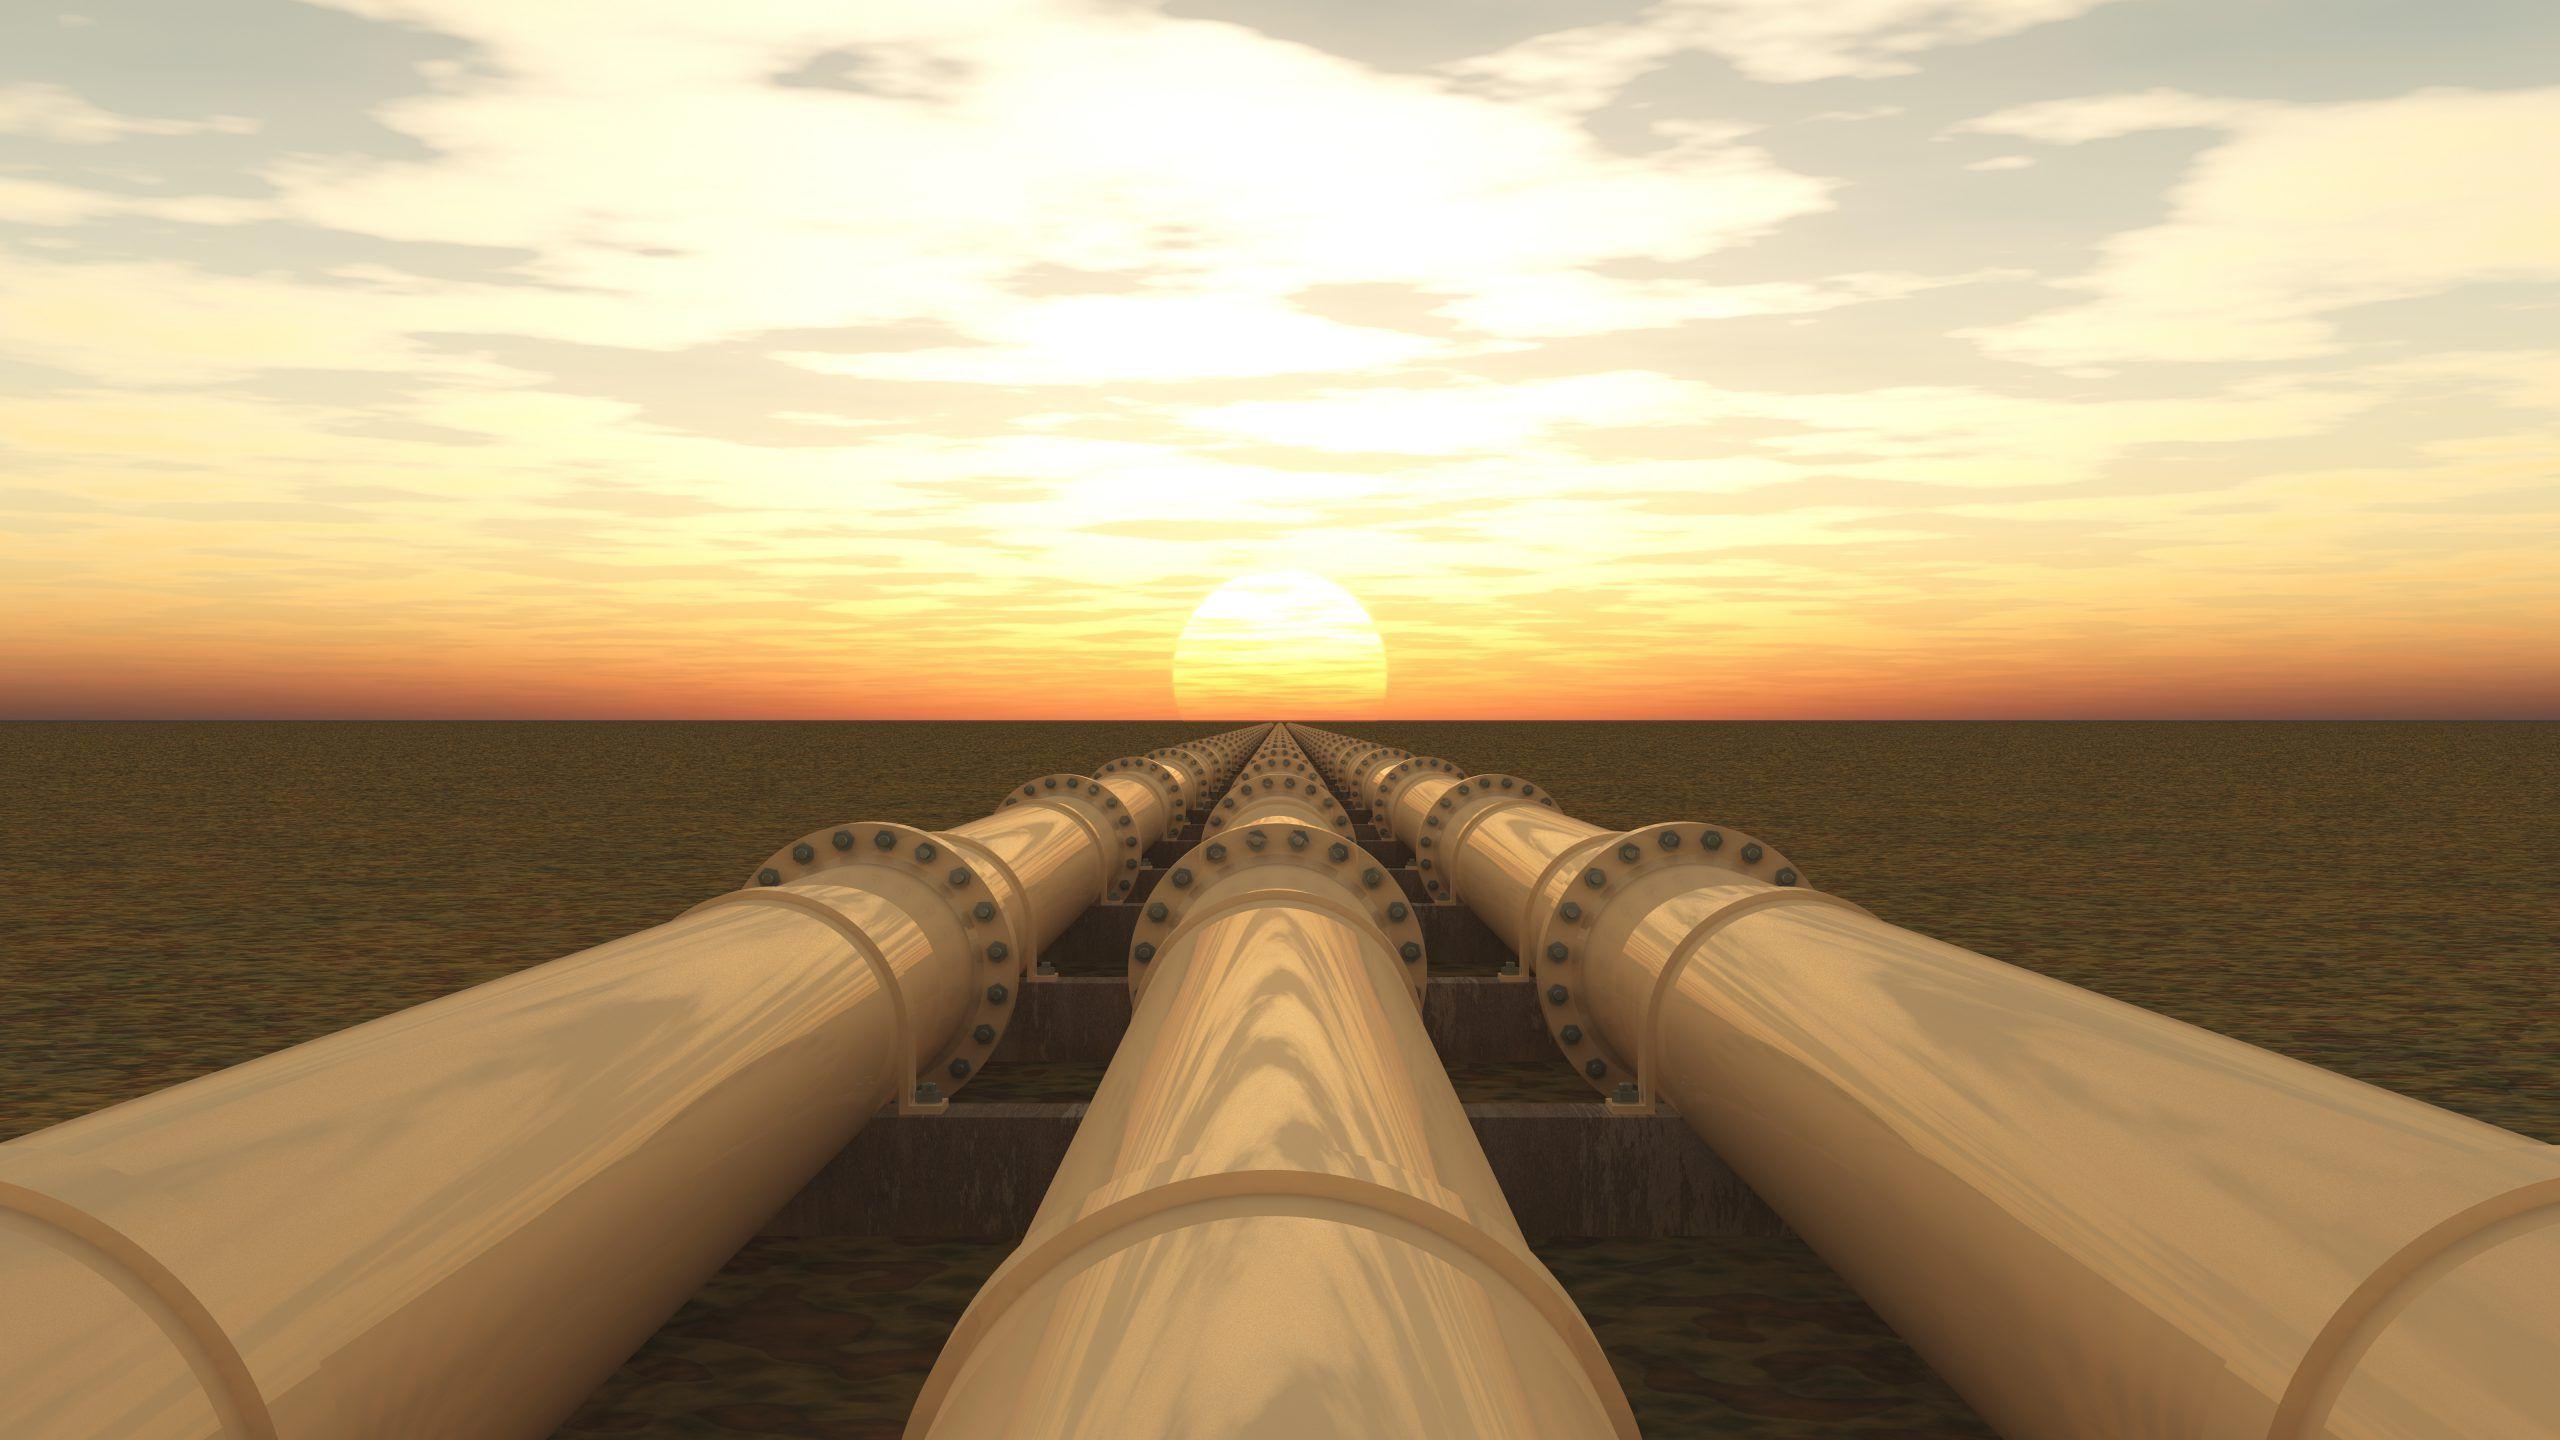 Pipeline hack exposes holes in U.S. cyber oversight